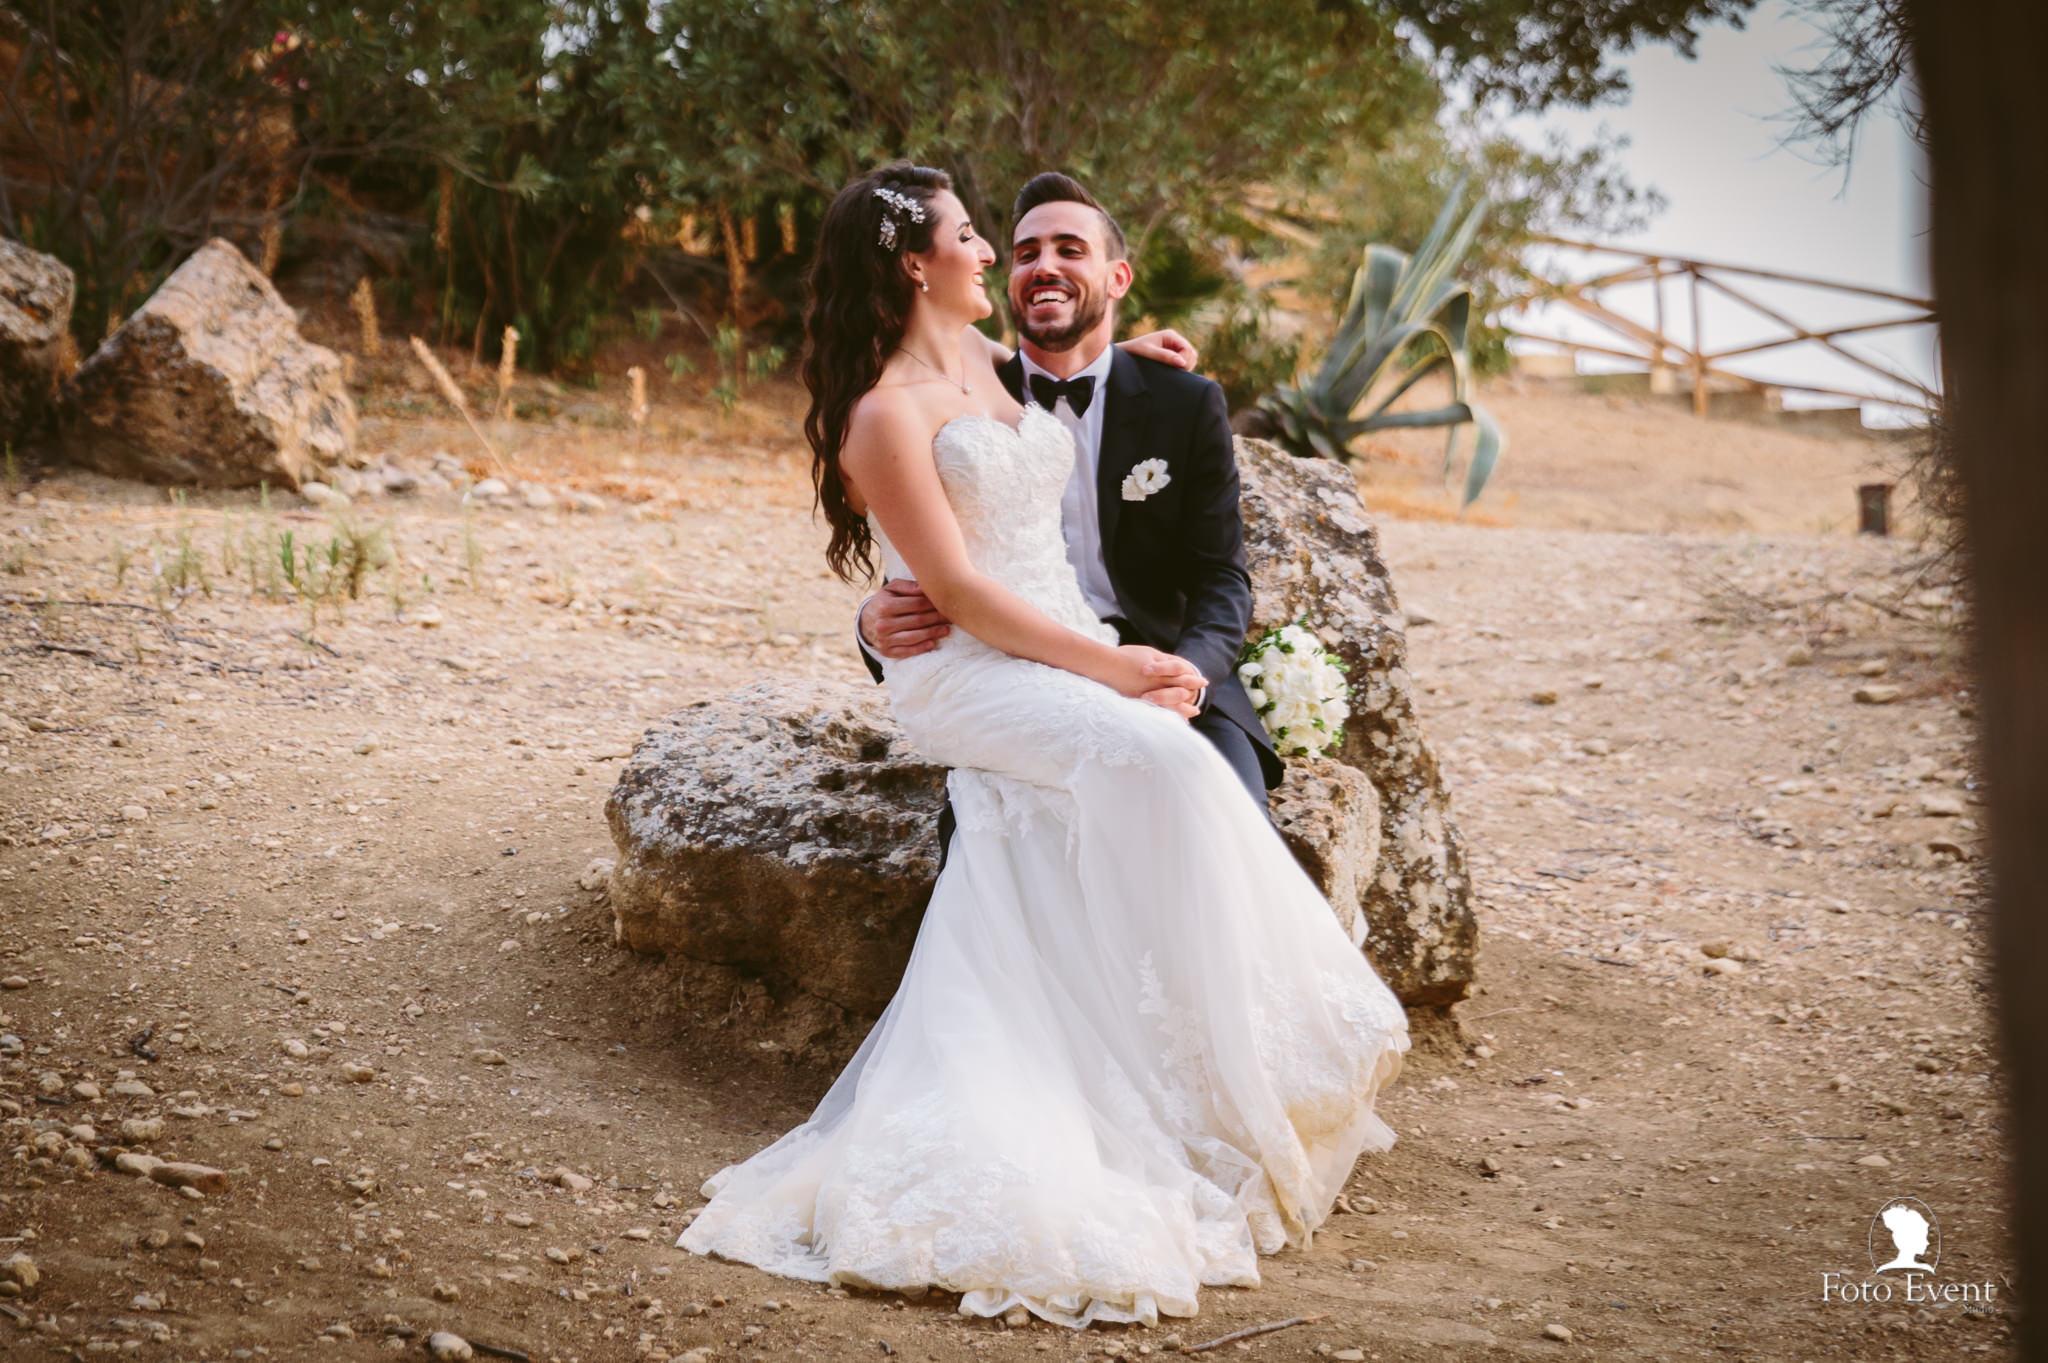 044-2019-08-31-Matrimonio-Serena-e-Saverio-Tarantino-5DE-1437